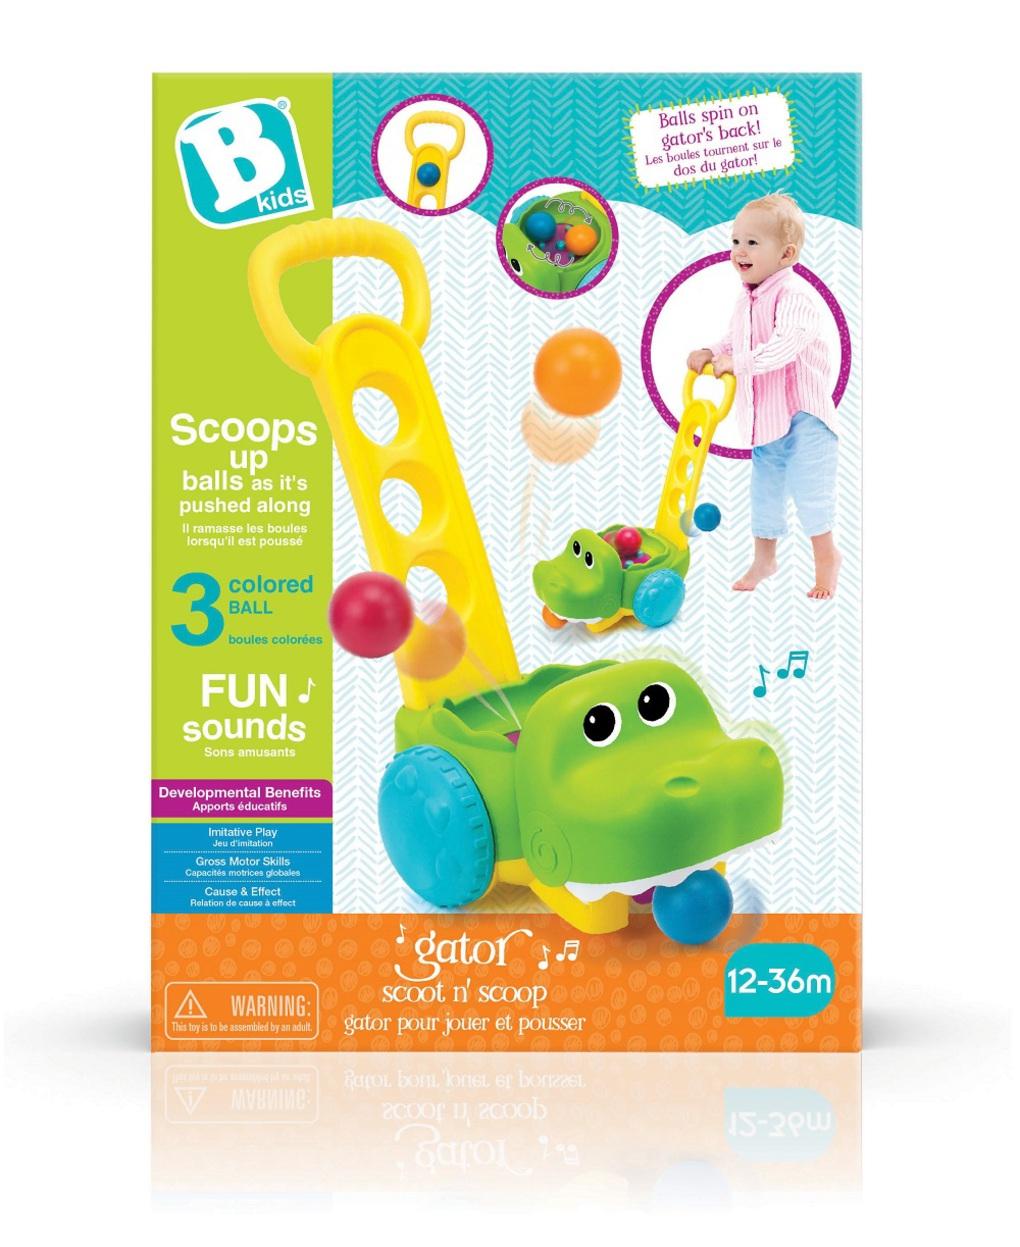 Bkids - crocodilo atirador de bola - B-kids